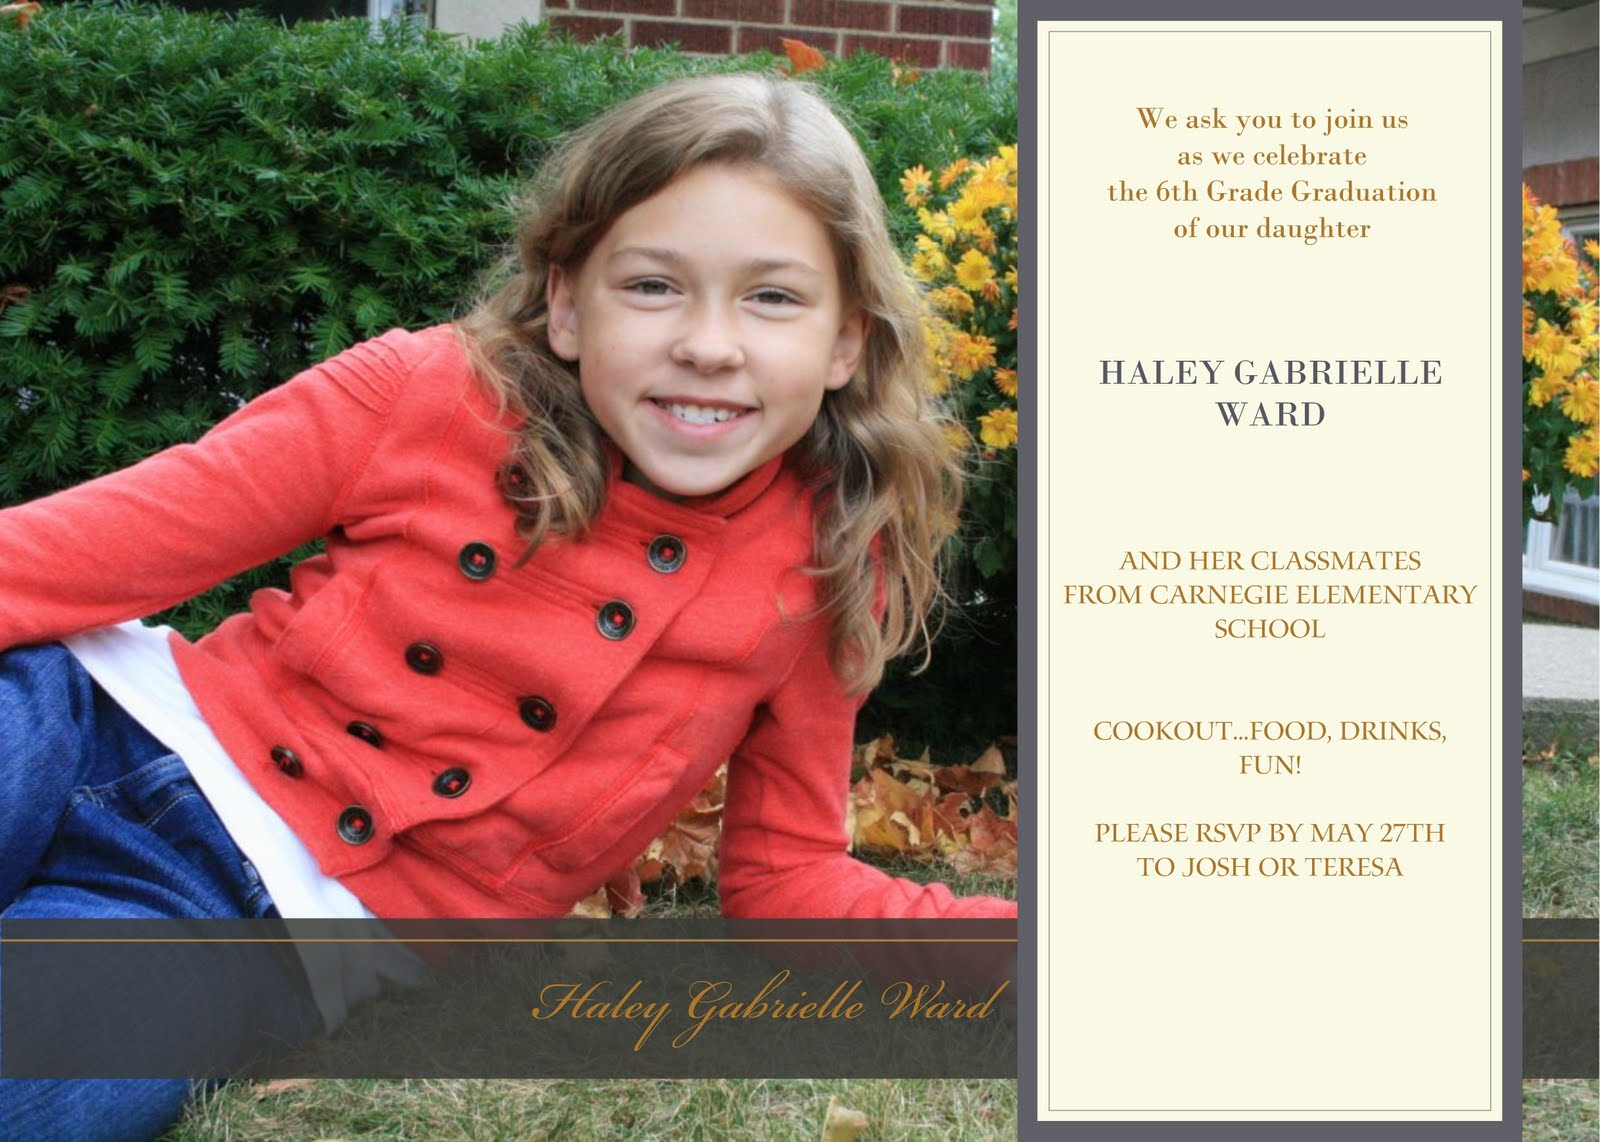 Party with the Ward\'s: Haley\'s 6th Grade Graduation Invitation